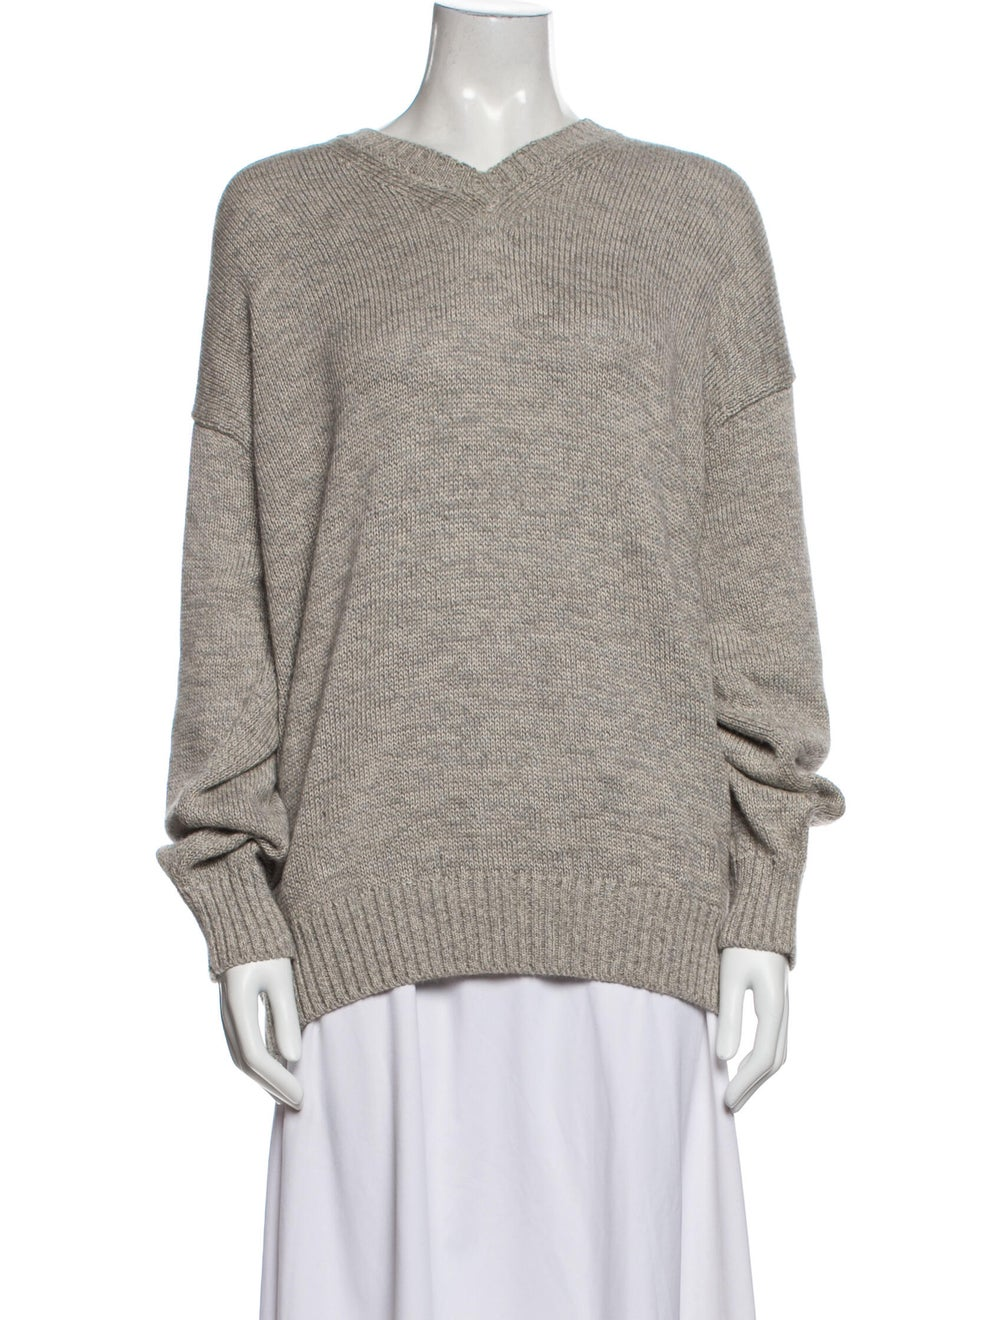 Inis Meáin V-Neck Sweater Grey - image 1